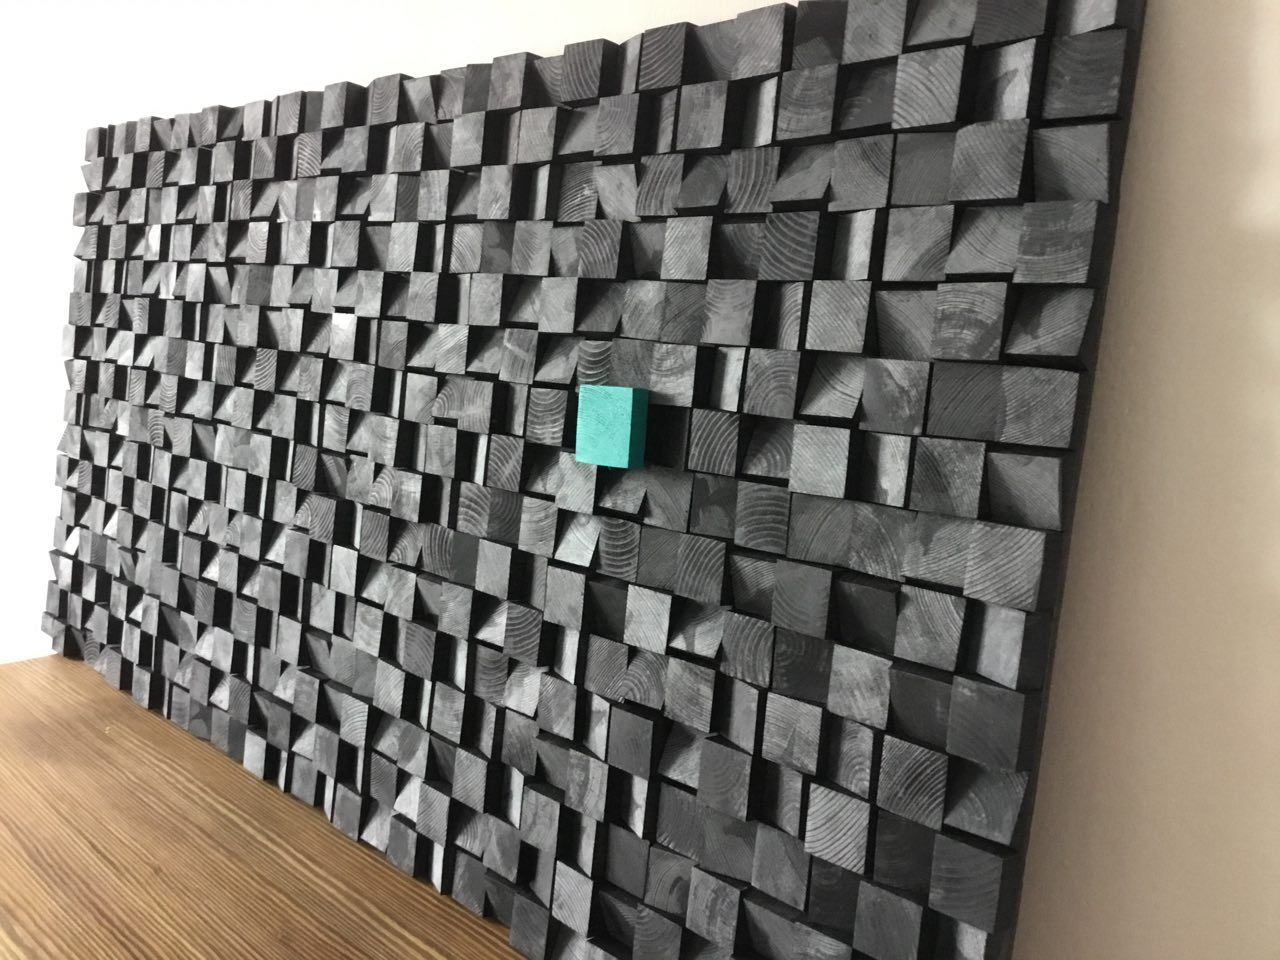 Wood Art Abstract Wall Art Rustic Wall Decor Wood Accent Wall